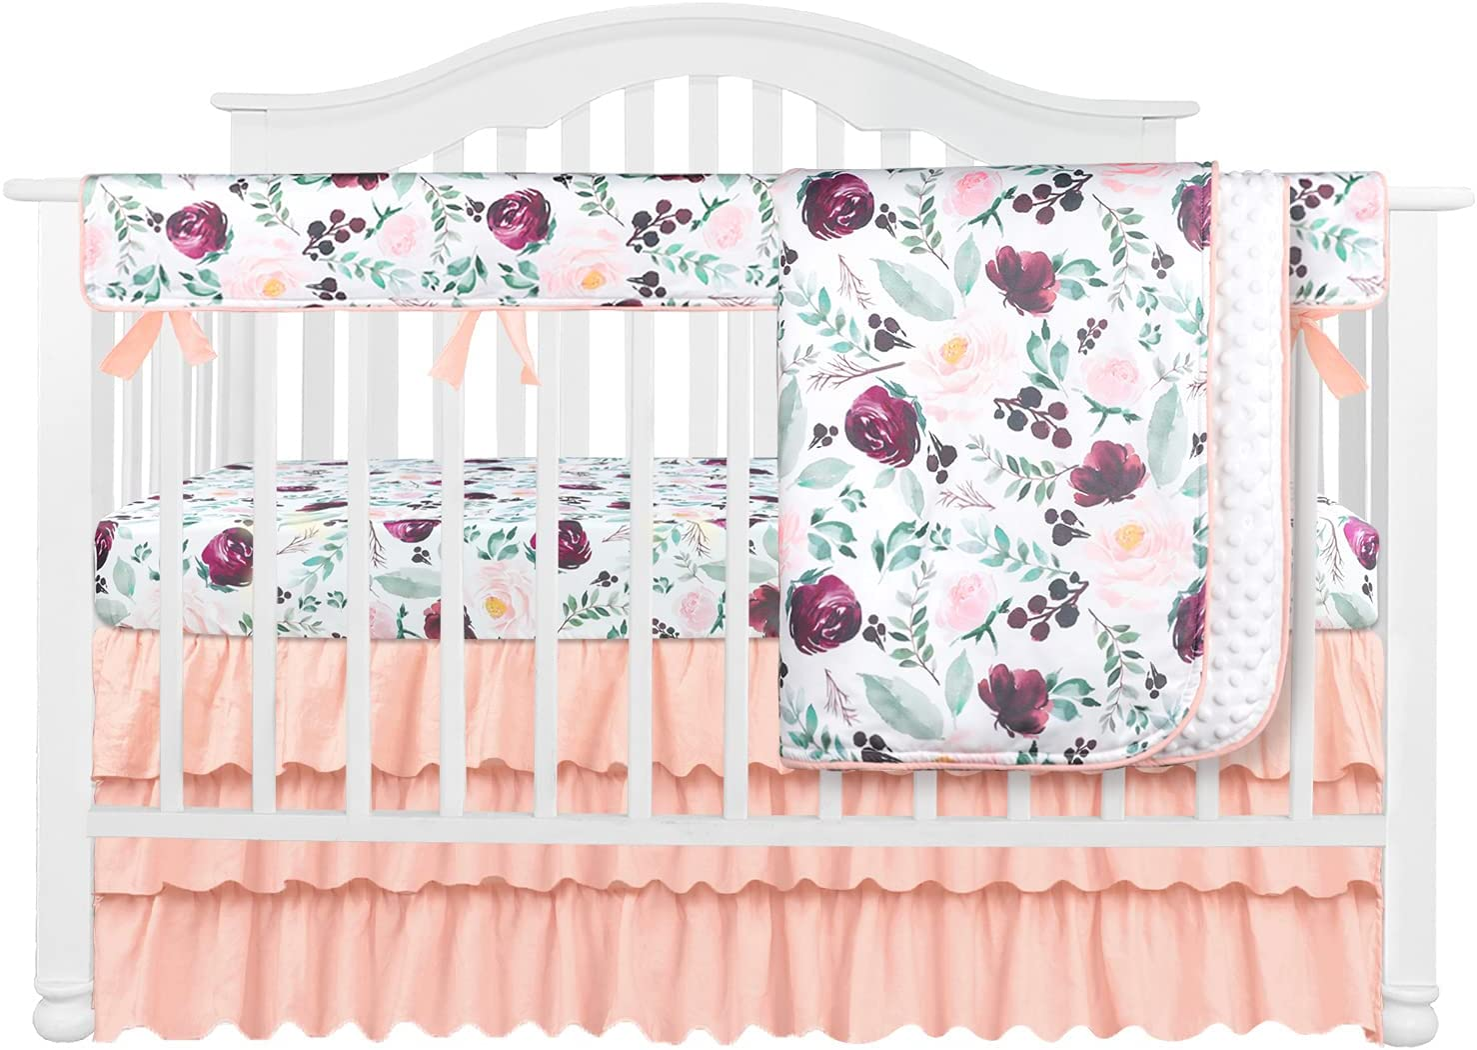 2021 new 4PCS Crib Bedding Set Baby Minky Blanket Nursery Bed Sale special price S Skirt